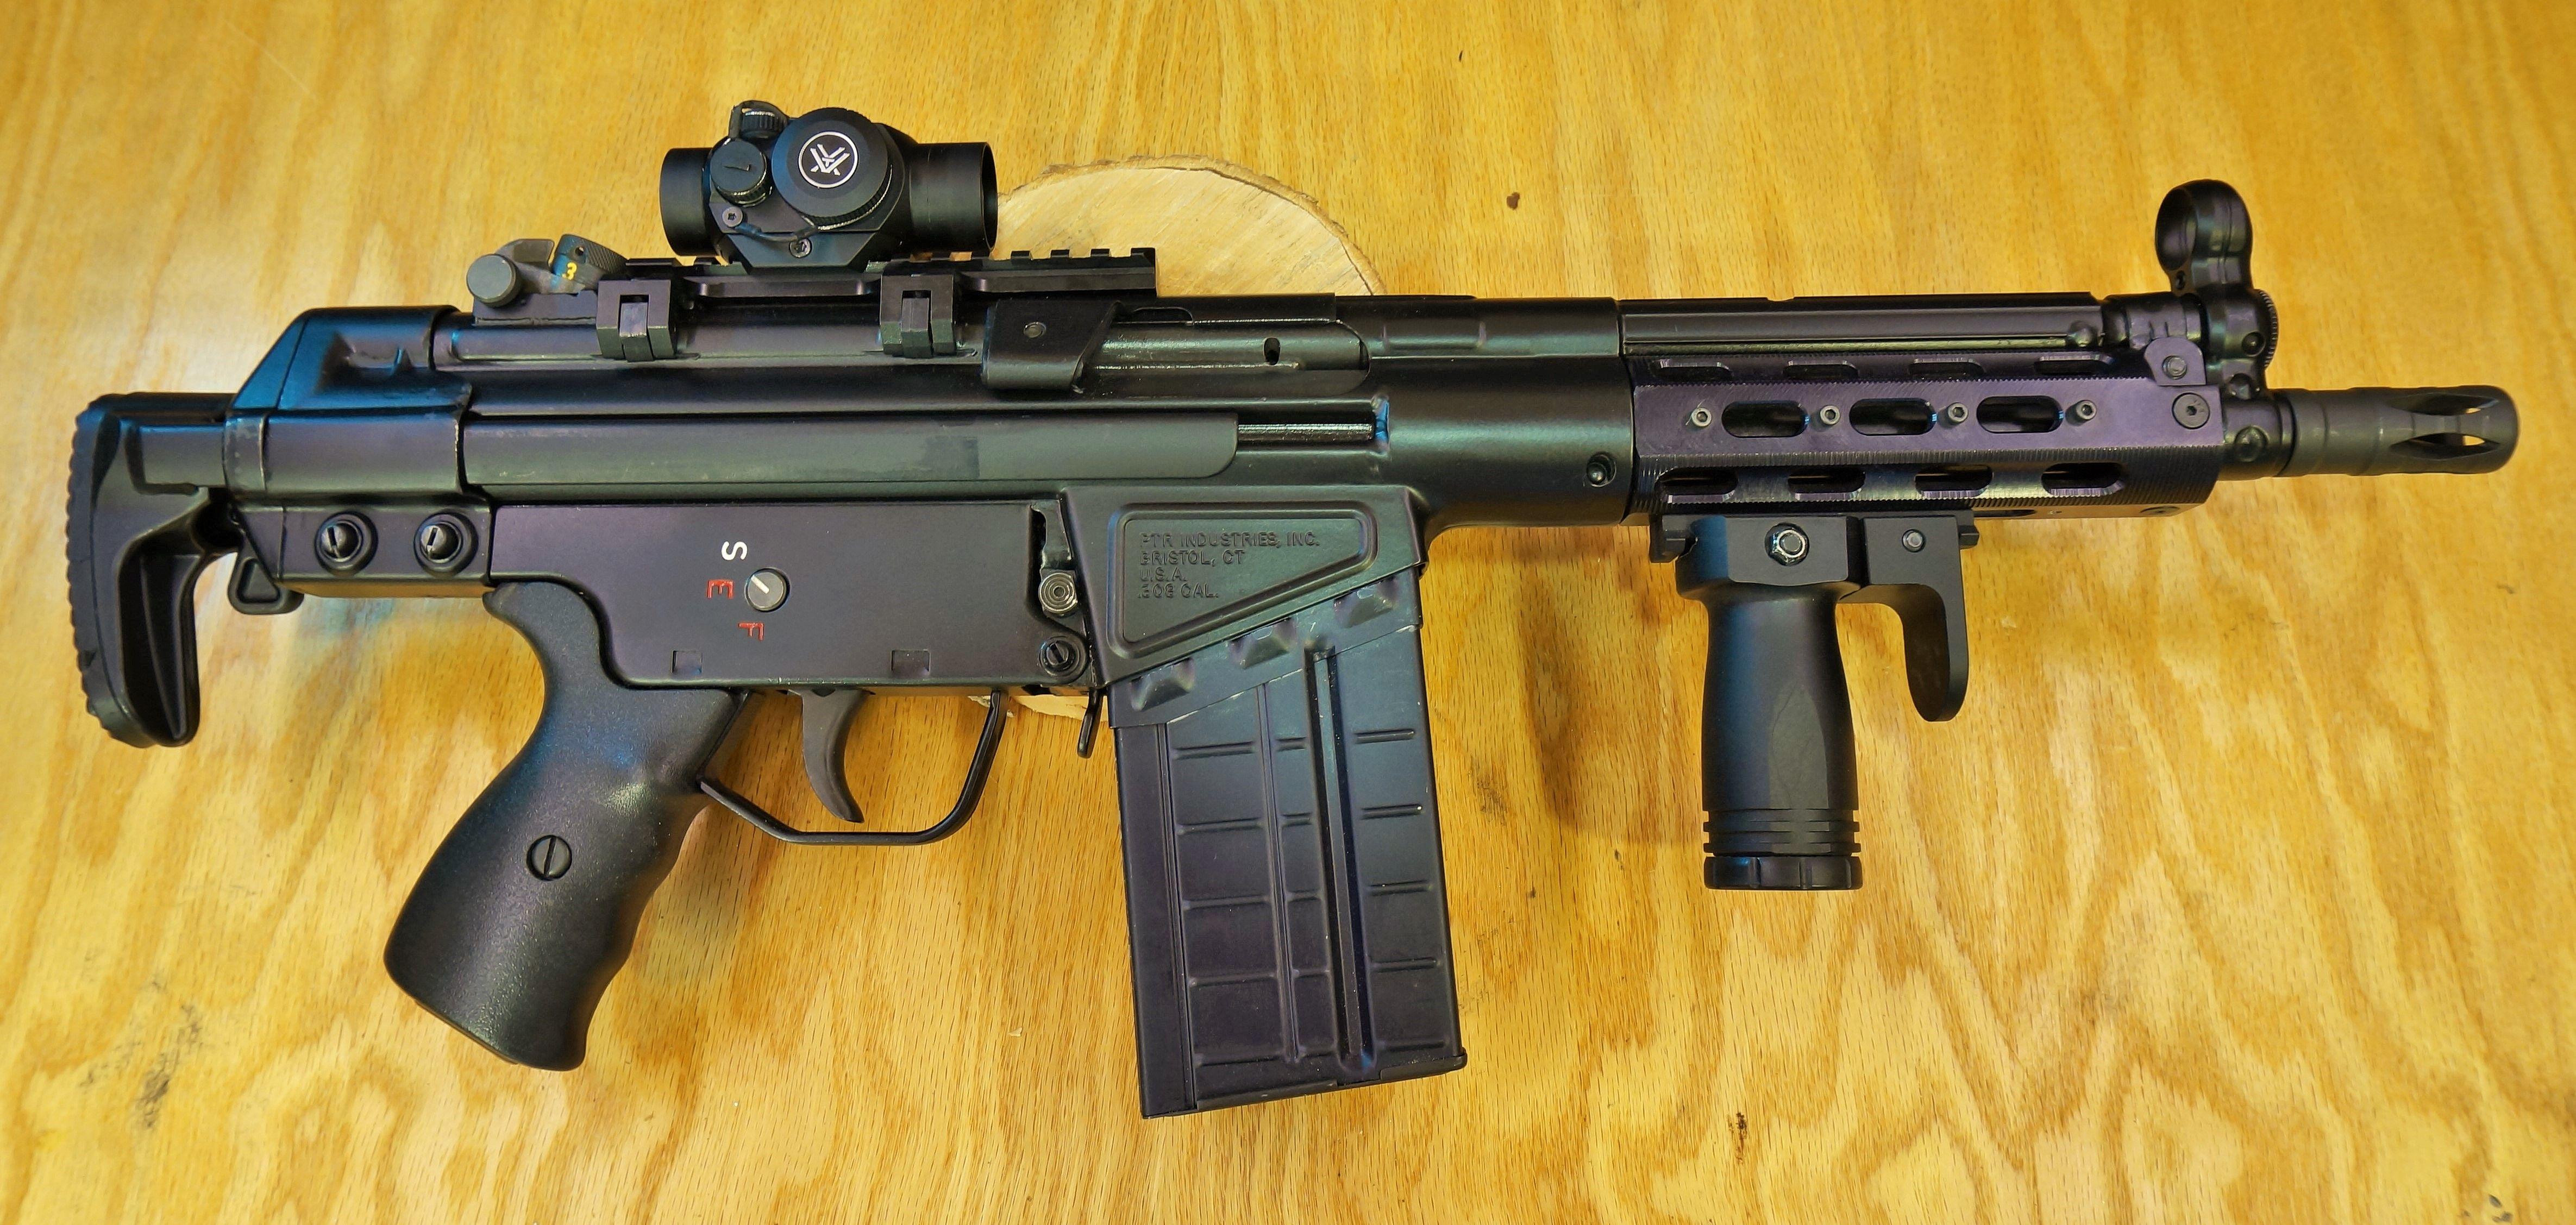 Ptr pdw sbr weapons pinterest oc guns and weapons ptr pdw sbr publicscrutiny Choice Image